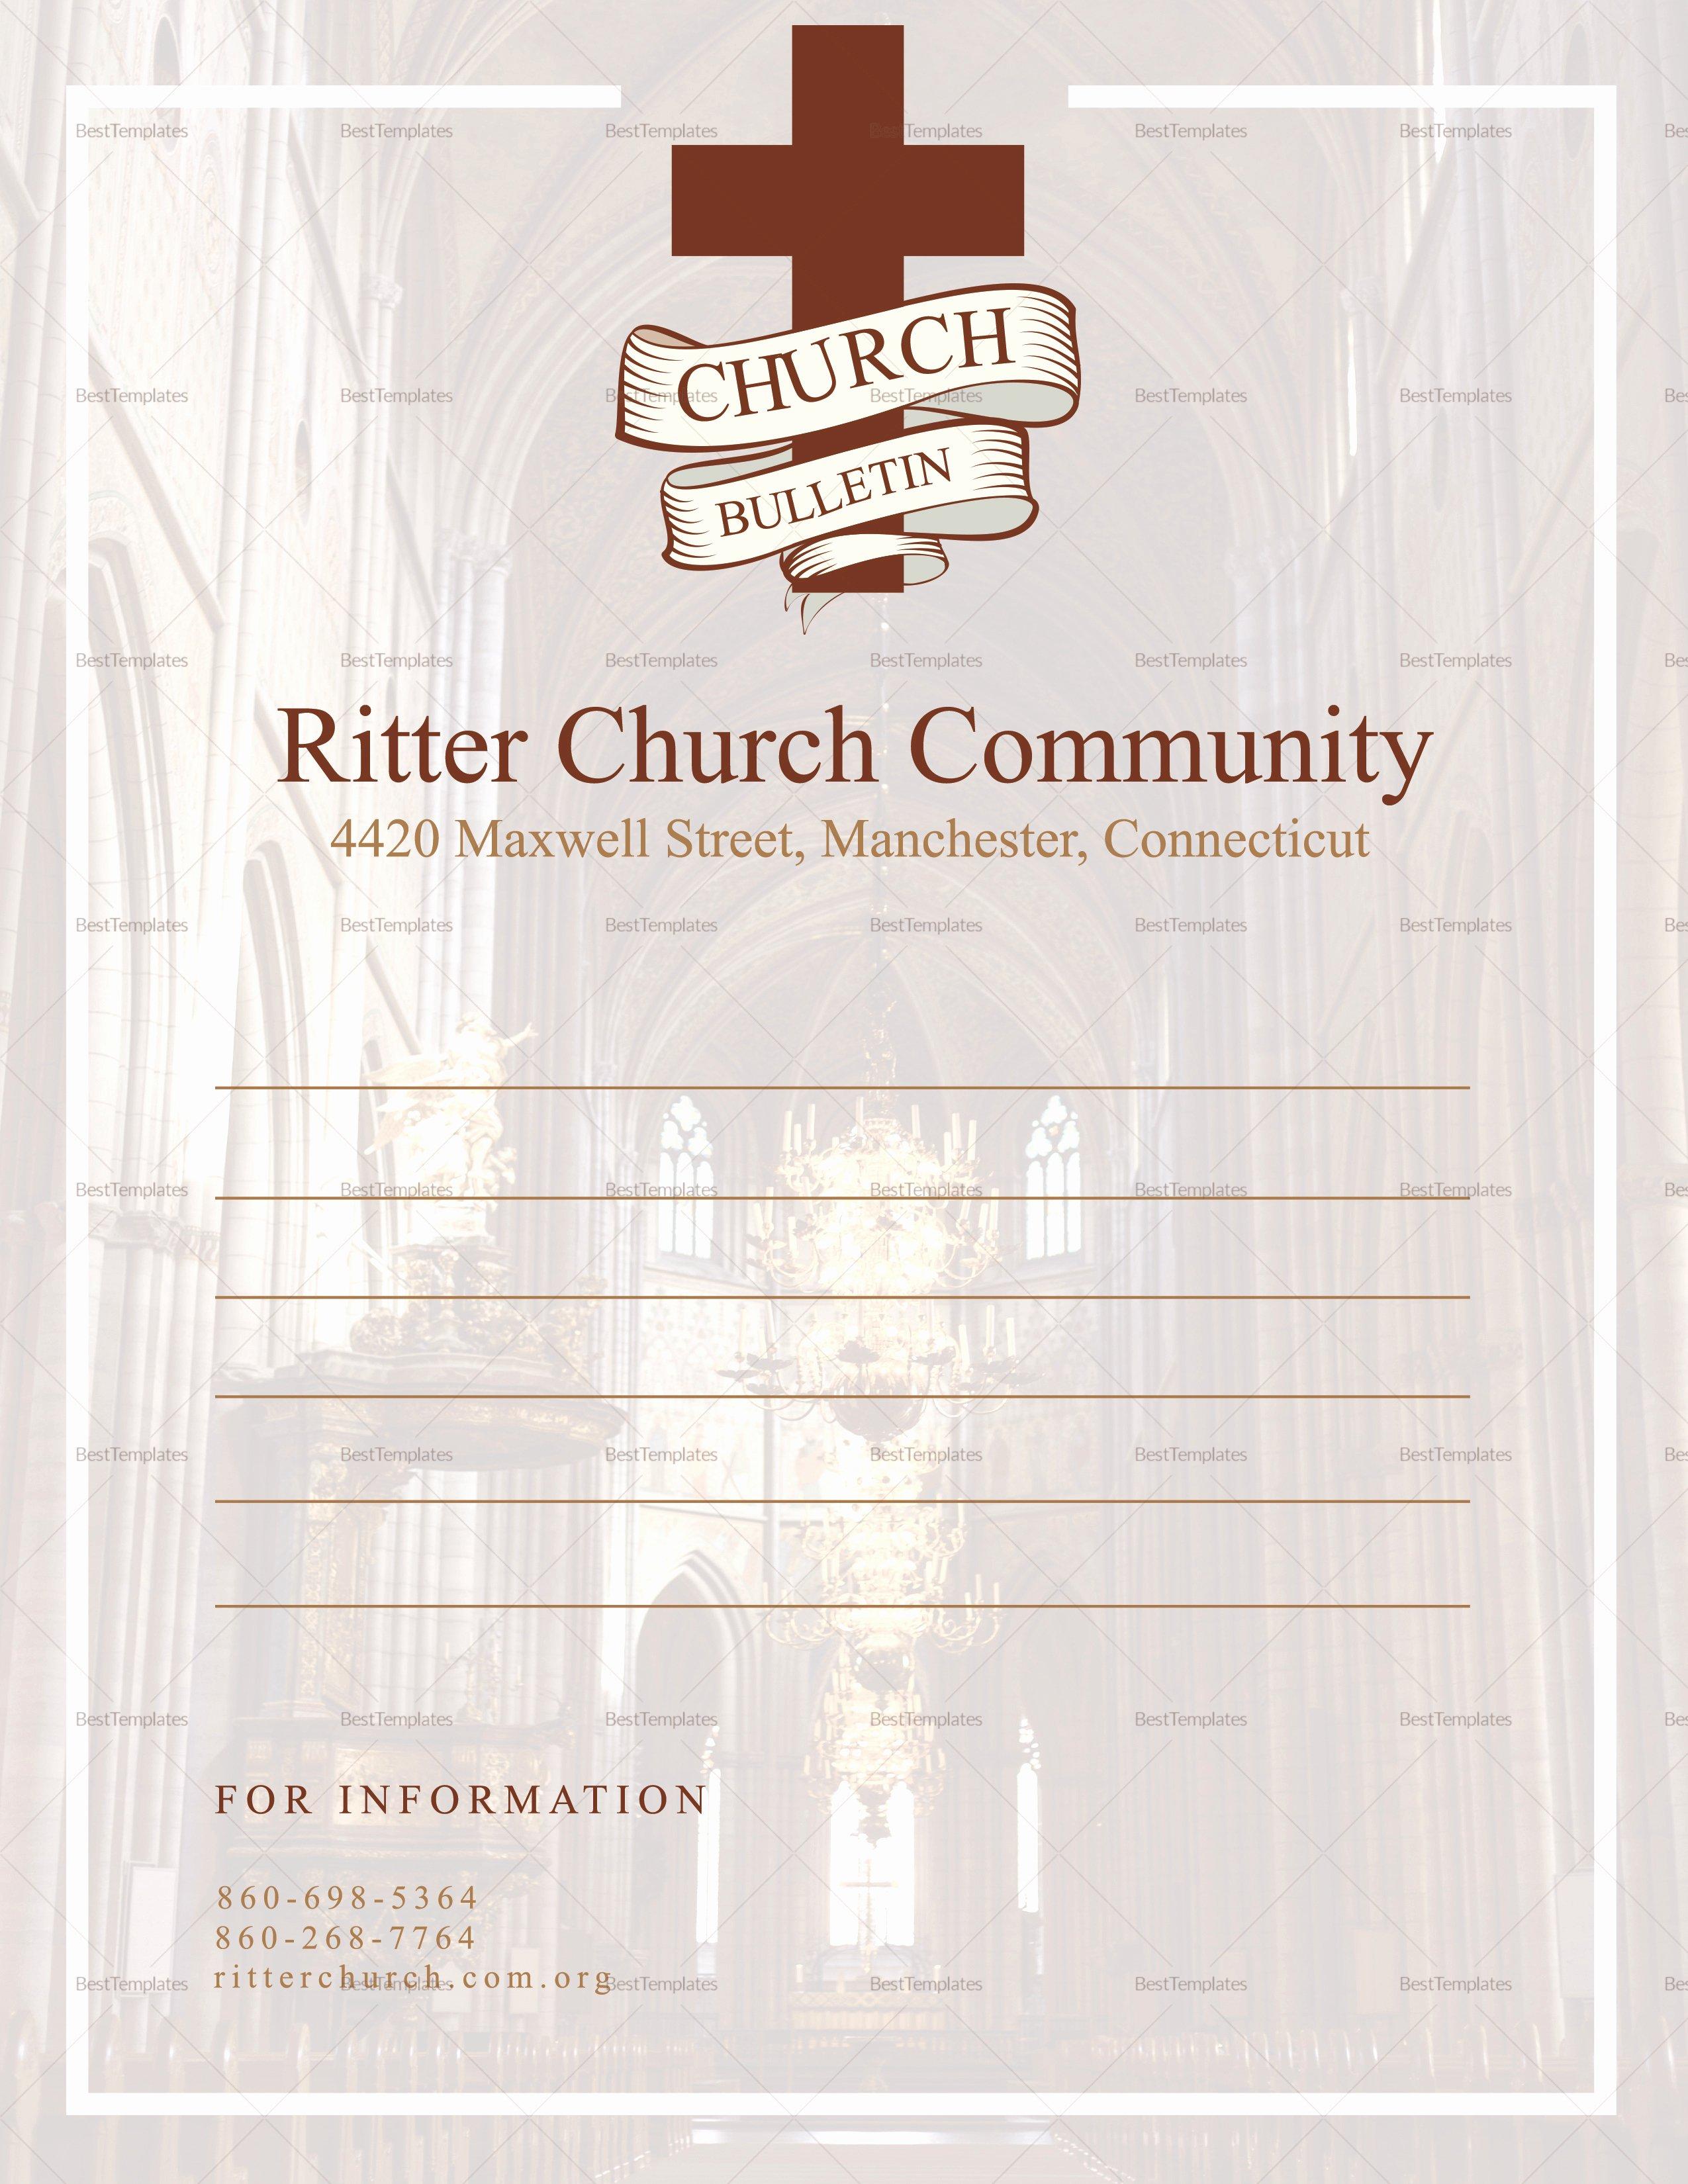 Church Bulletin Templates Microsoft Publisher Beautiful Church Bulletin and Connect Card Flyer Design Template In